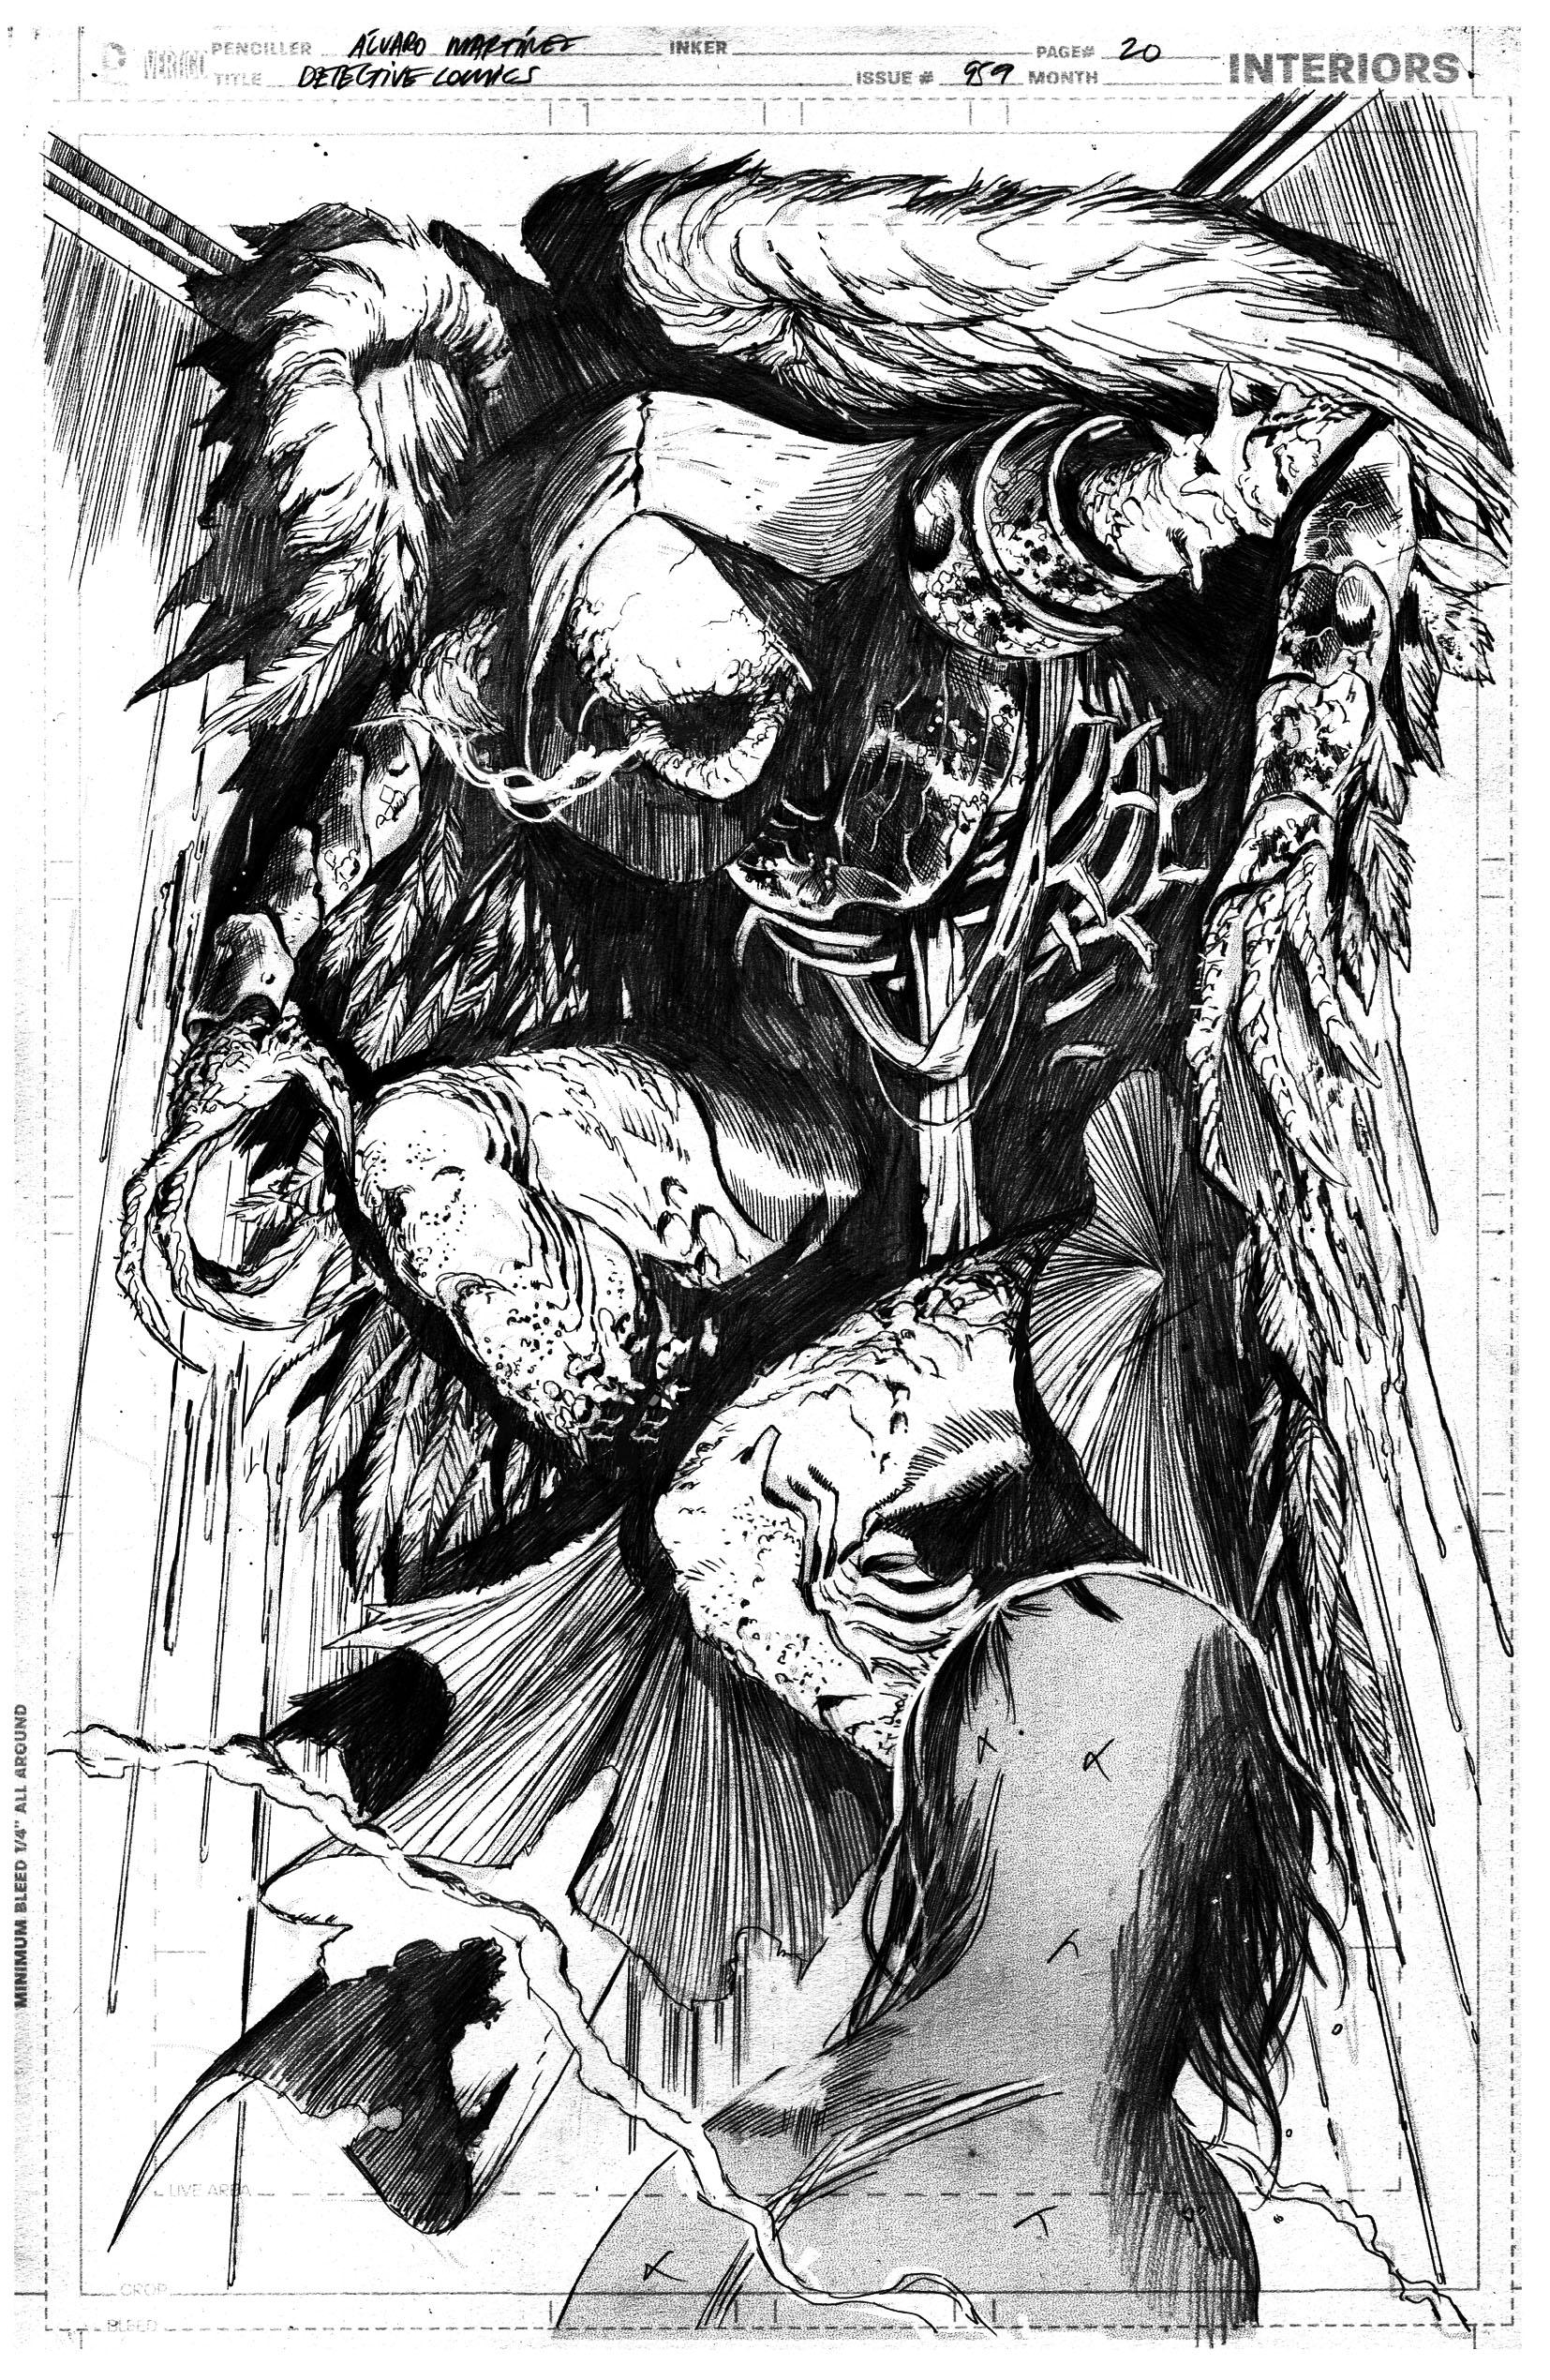 Detective Comics #959 page 20